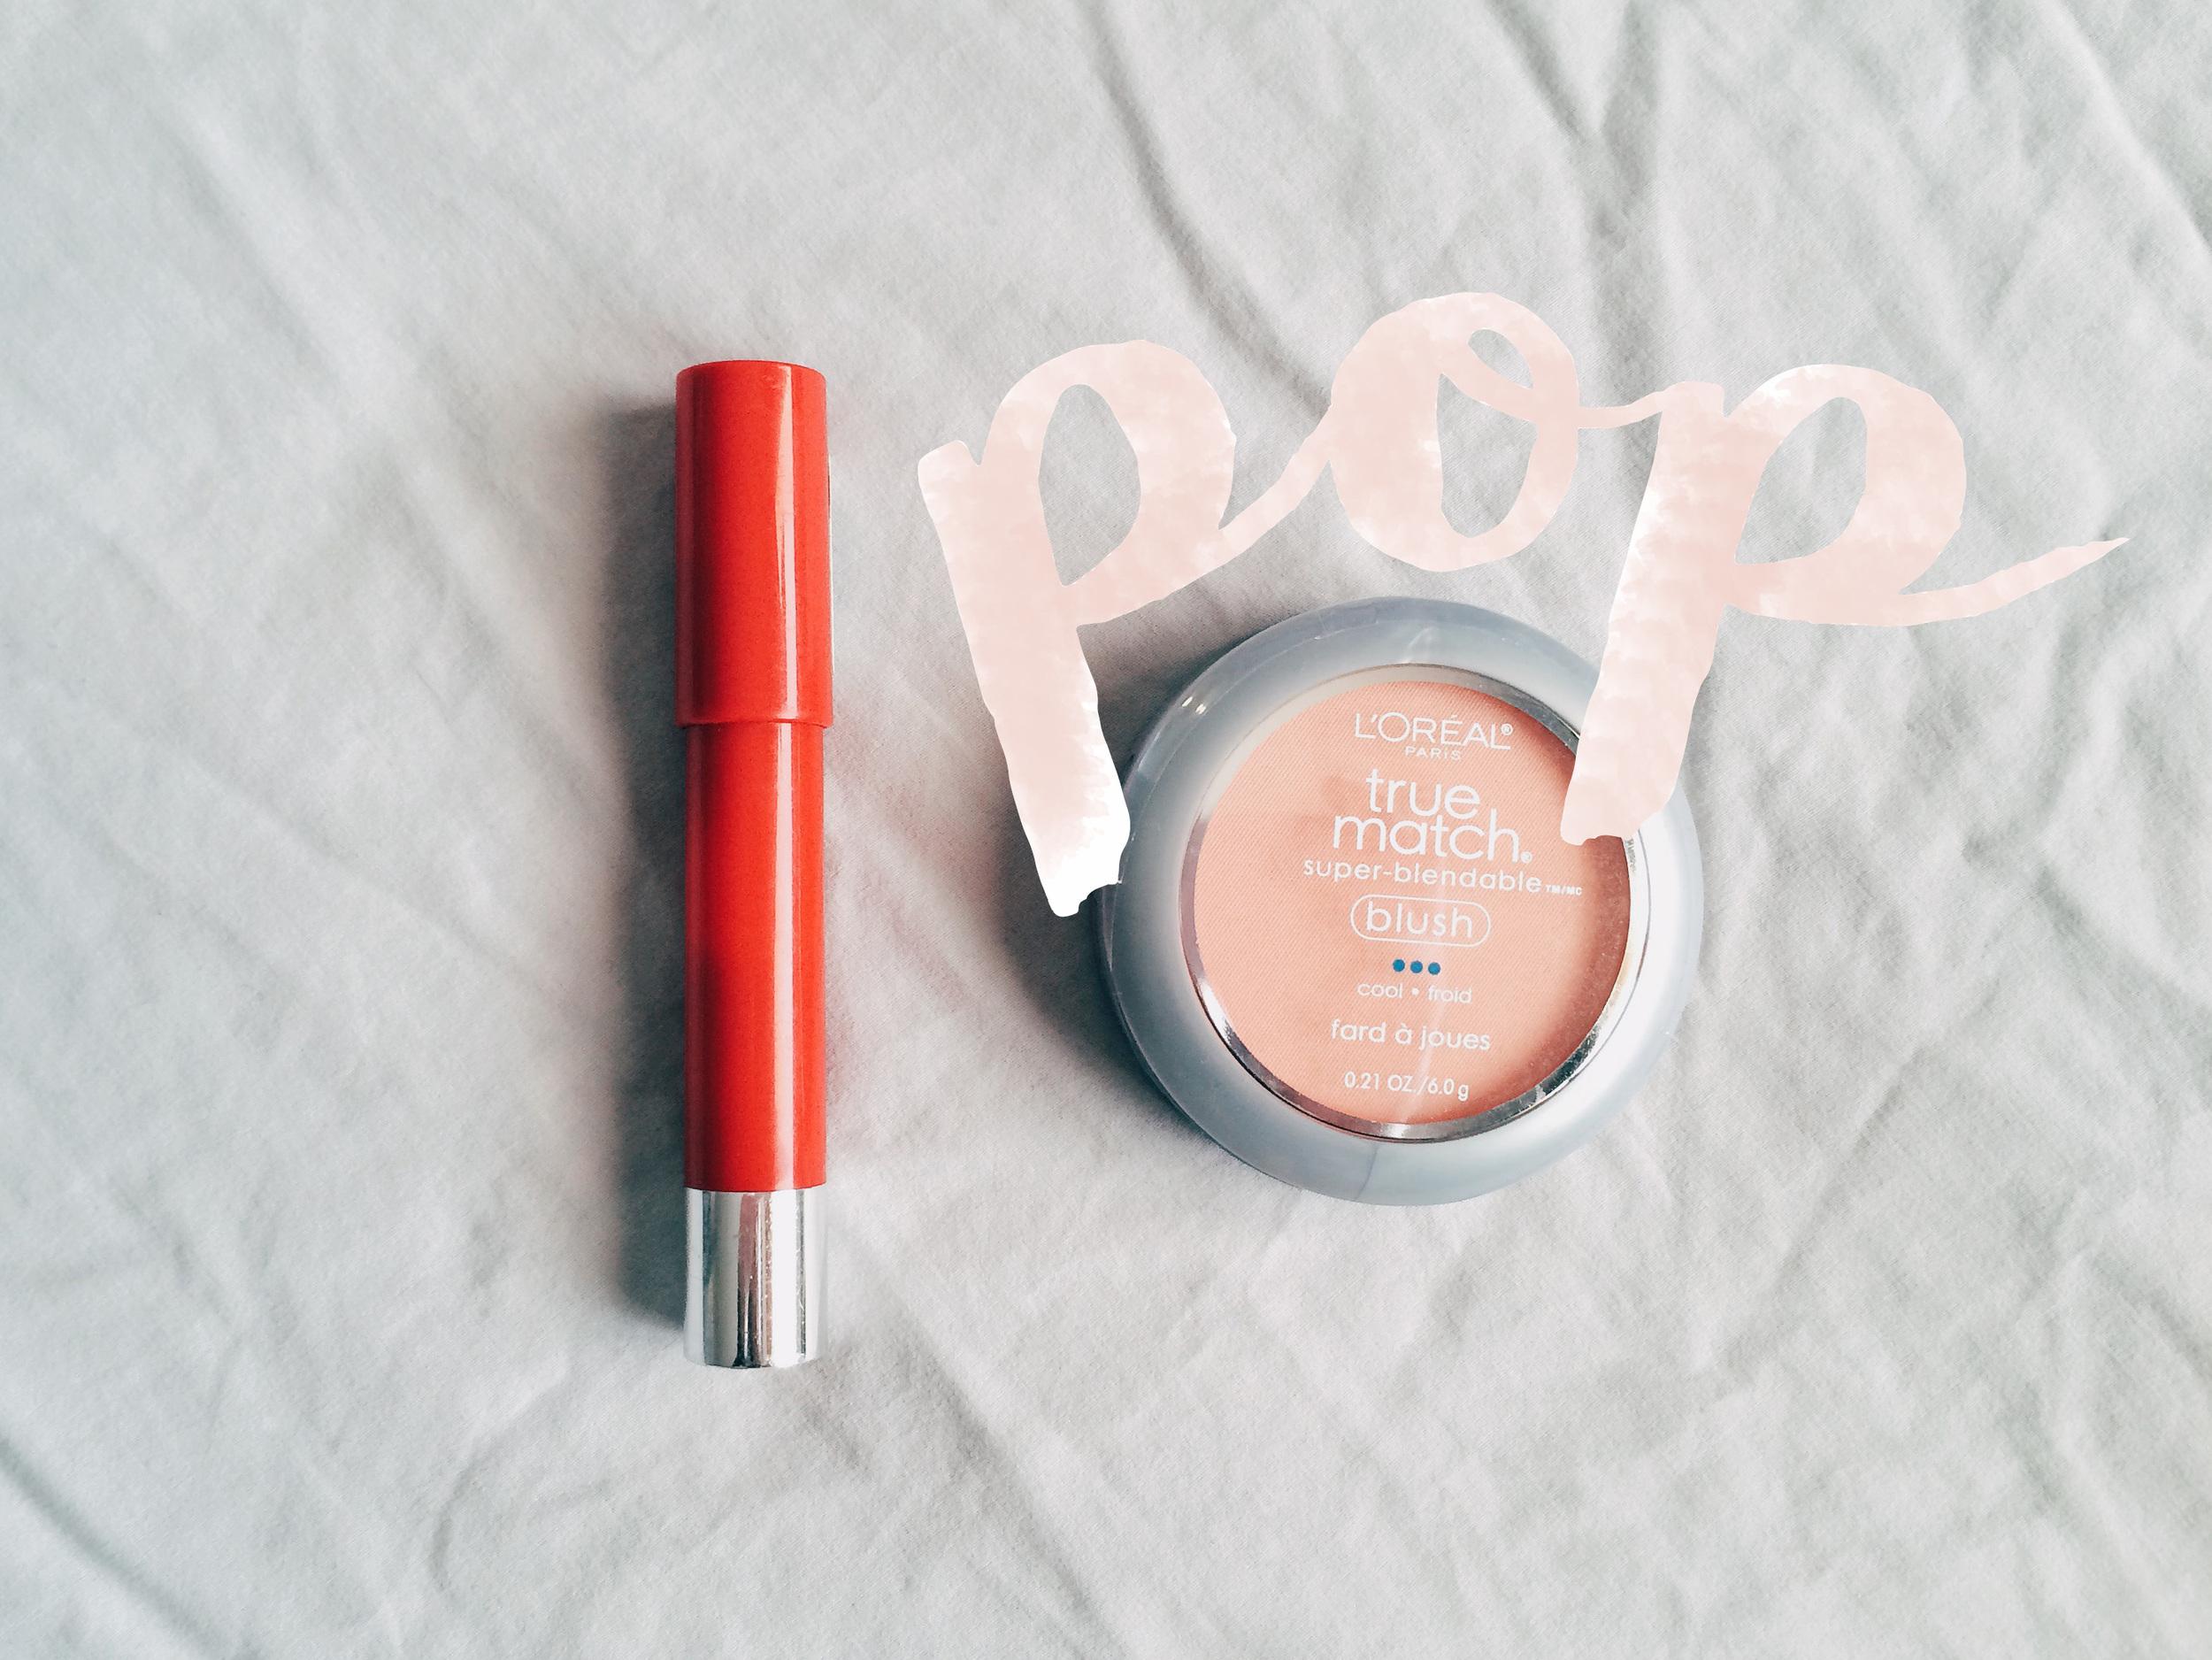 Revlon's Lipstain /  Loreal True Match Blush